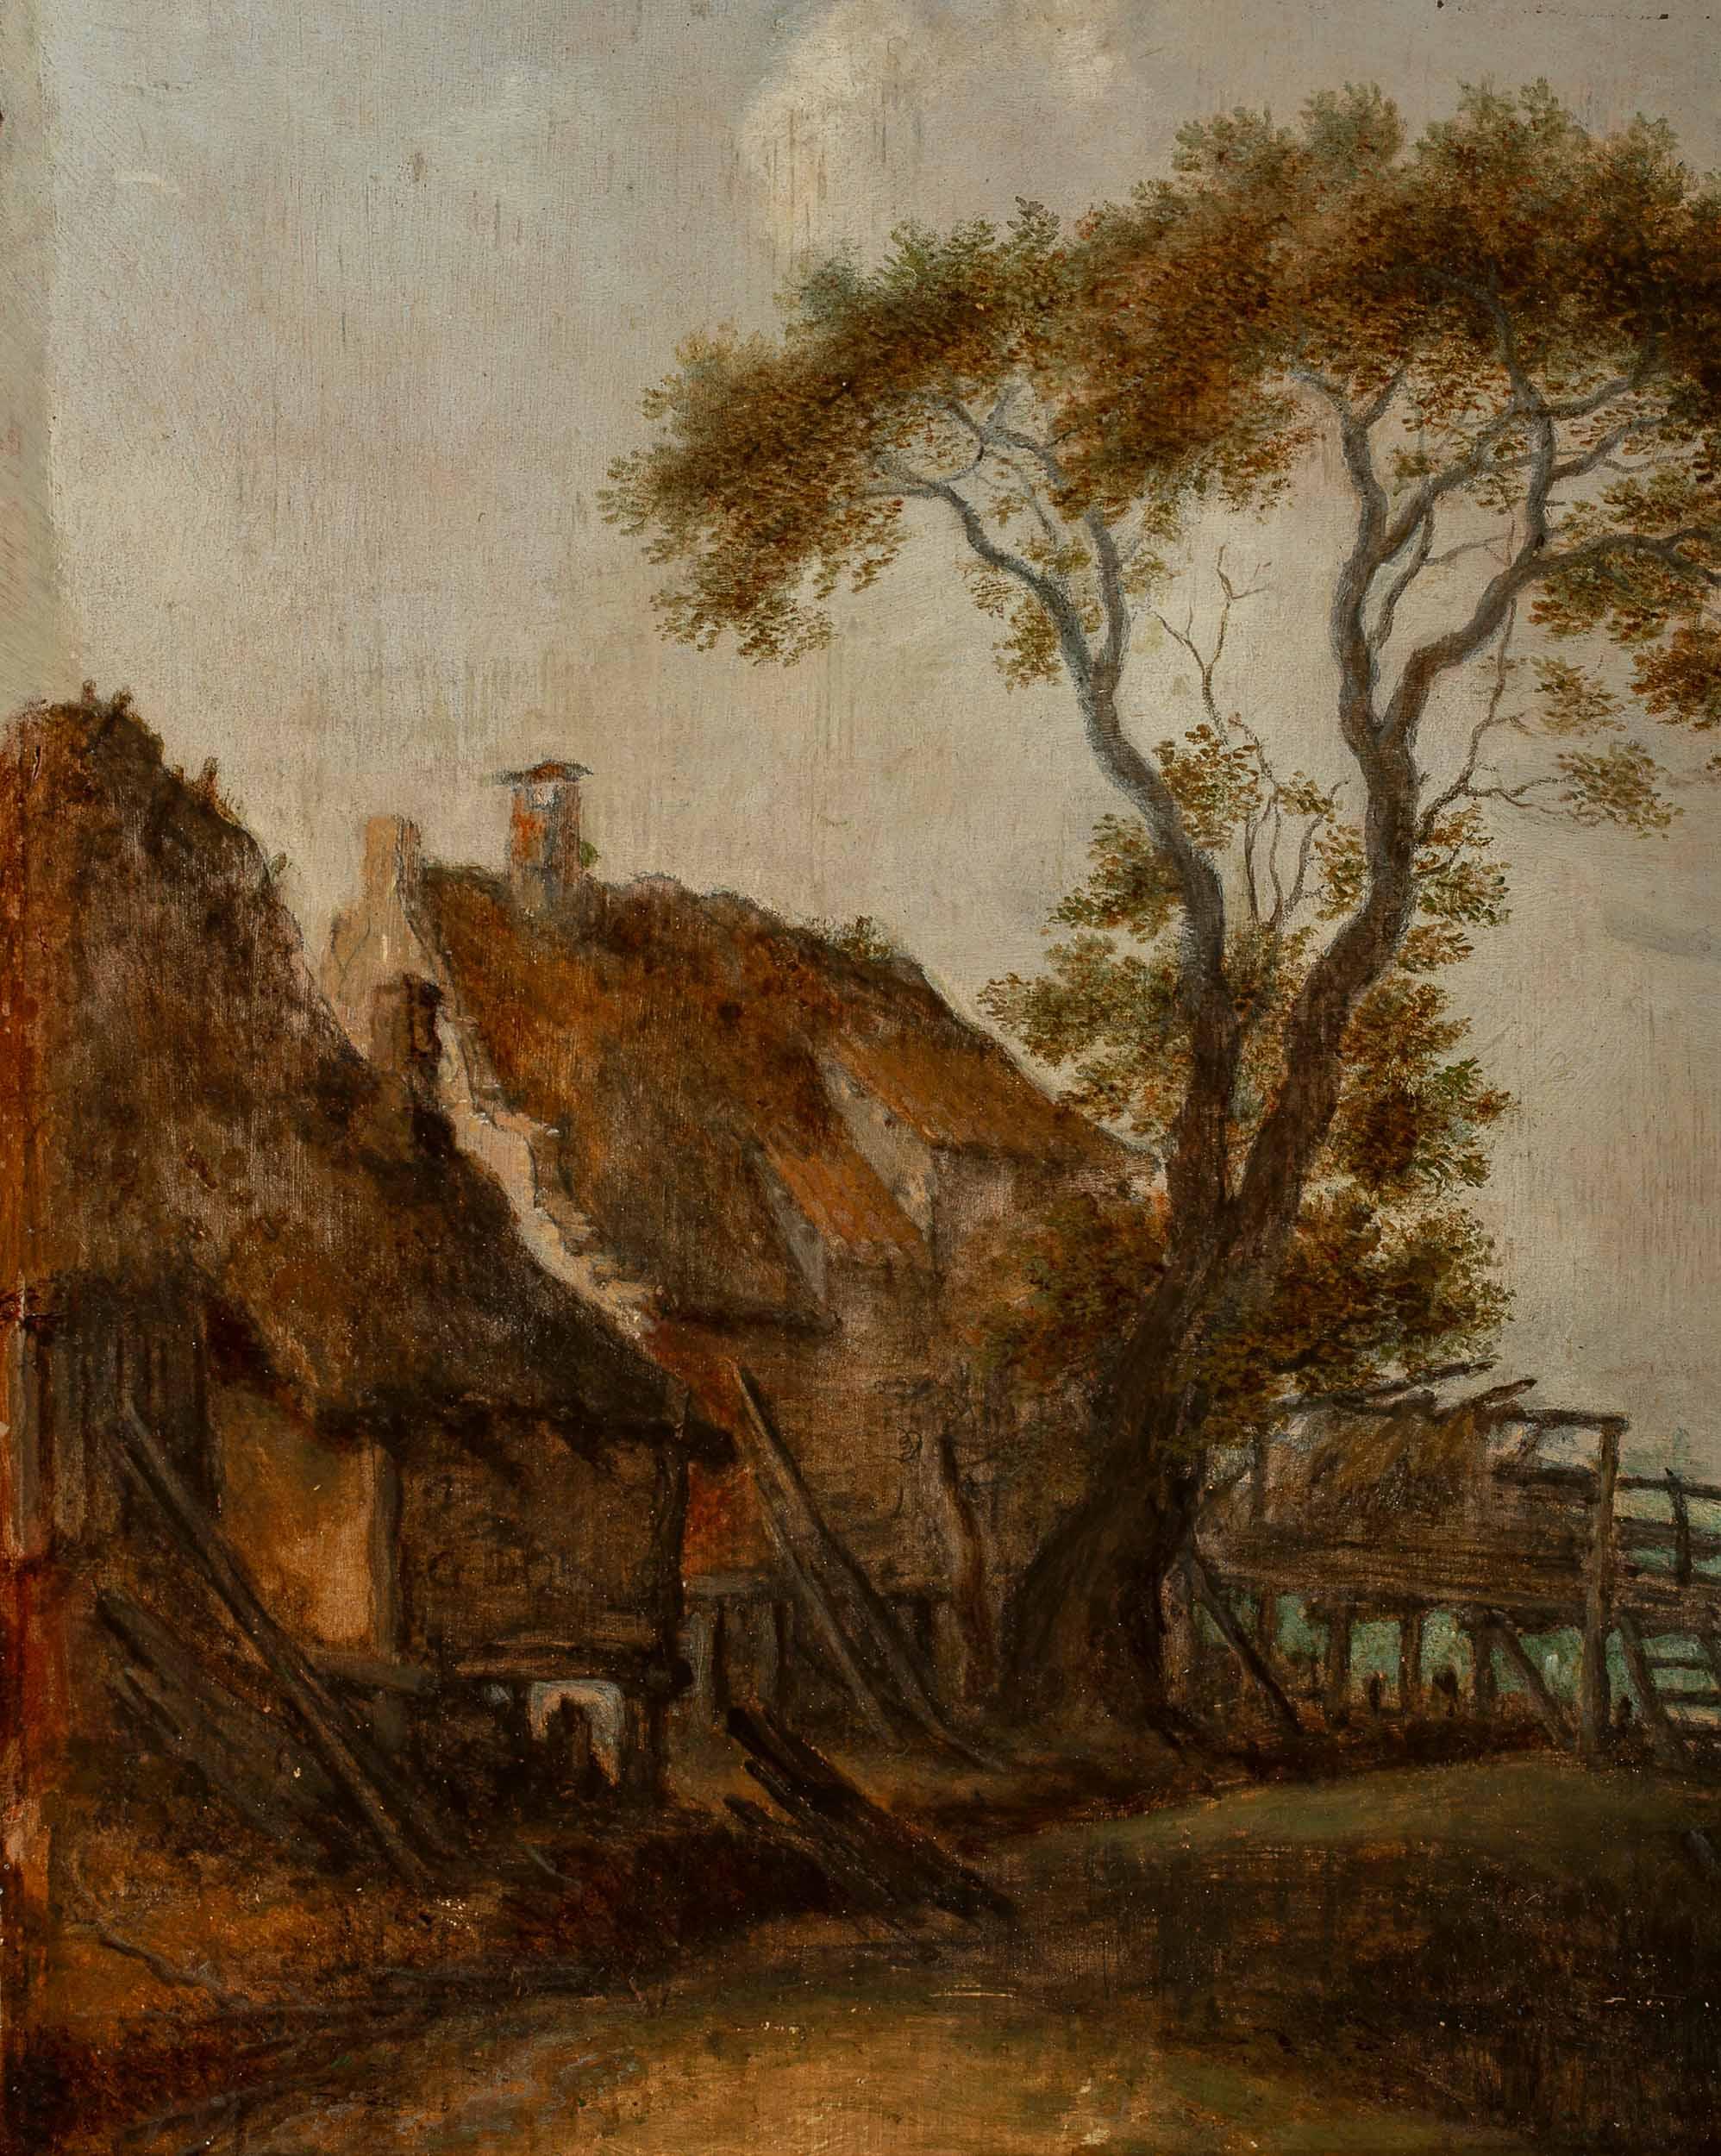 Farmhouse (c. 1620-1625)